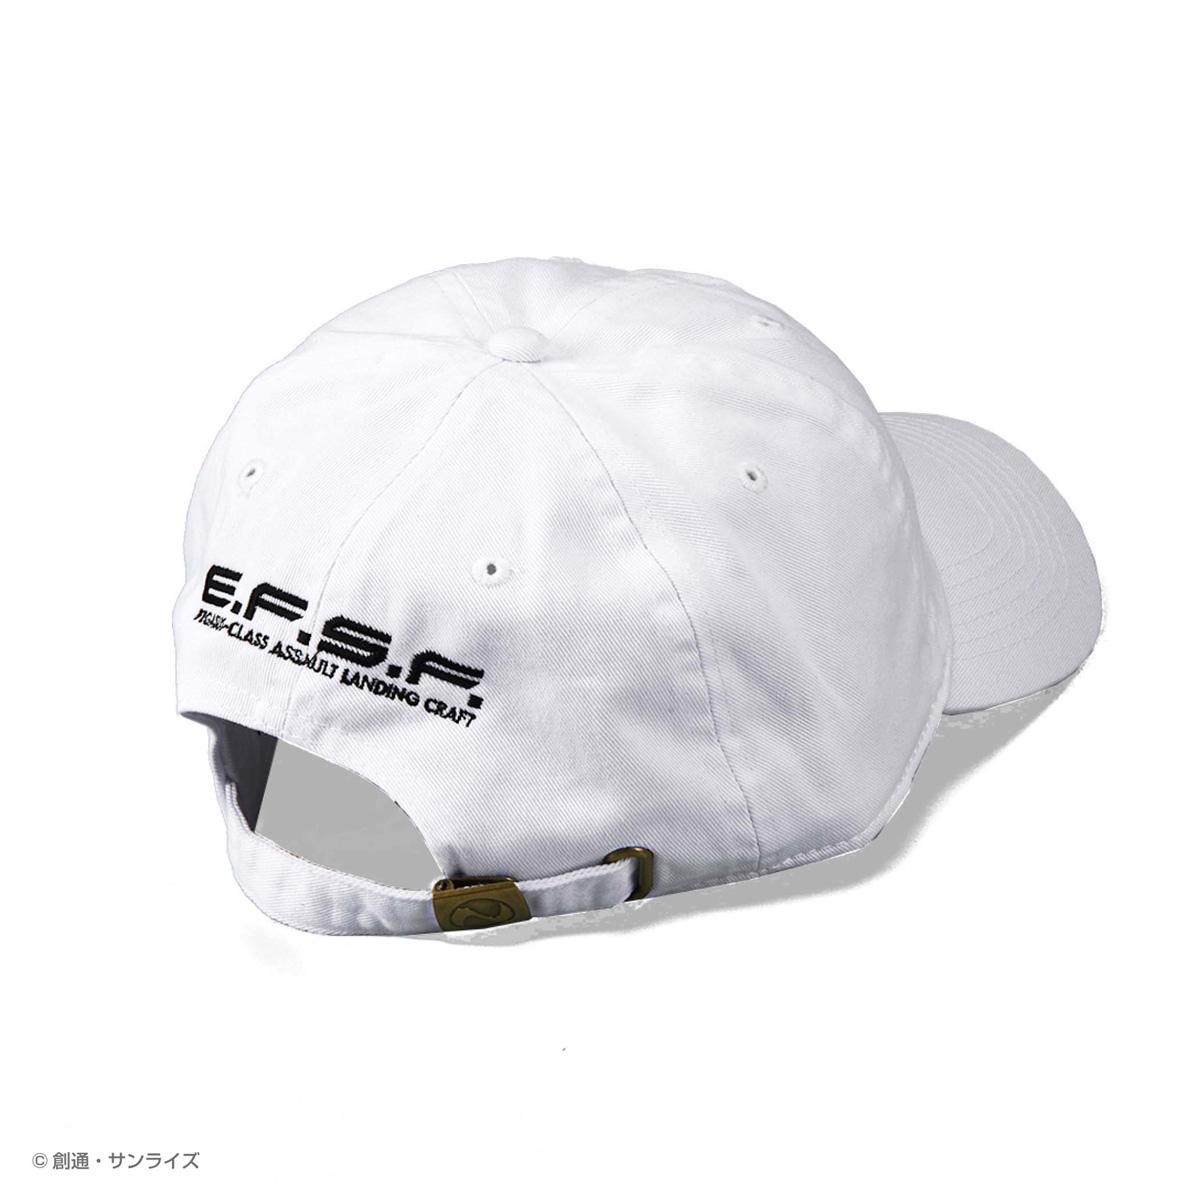 STRICT-G 『機動戦士ガンダム』 WHITE BASE Baseball Cap